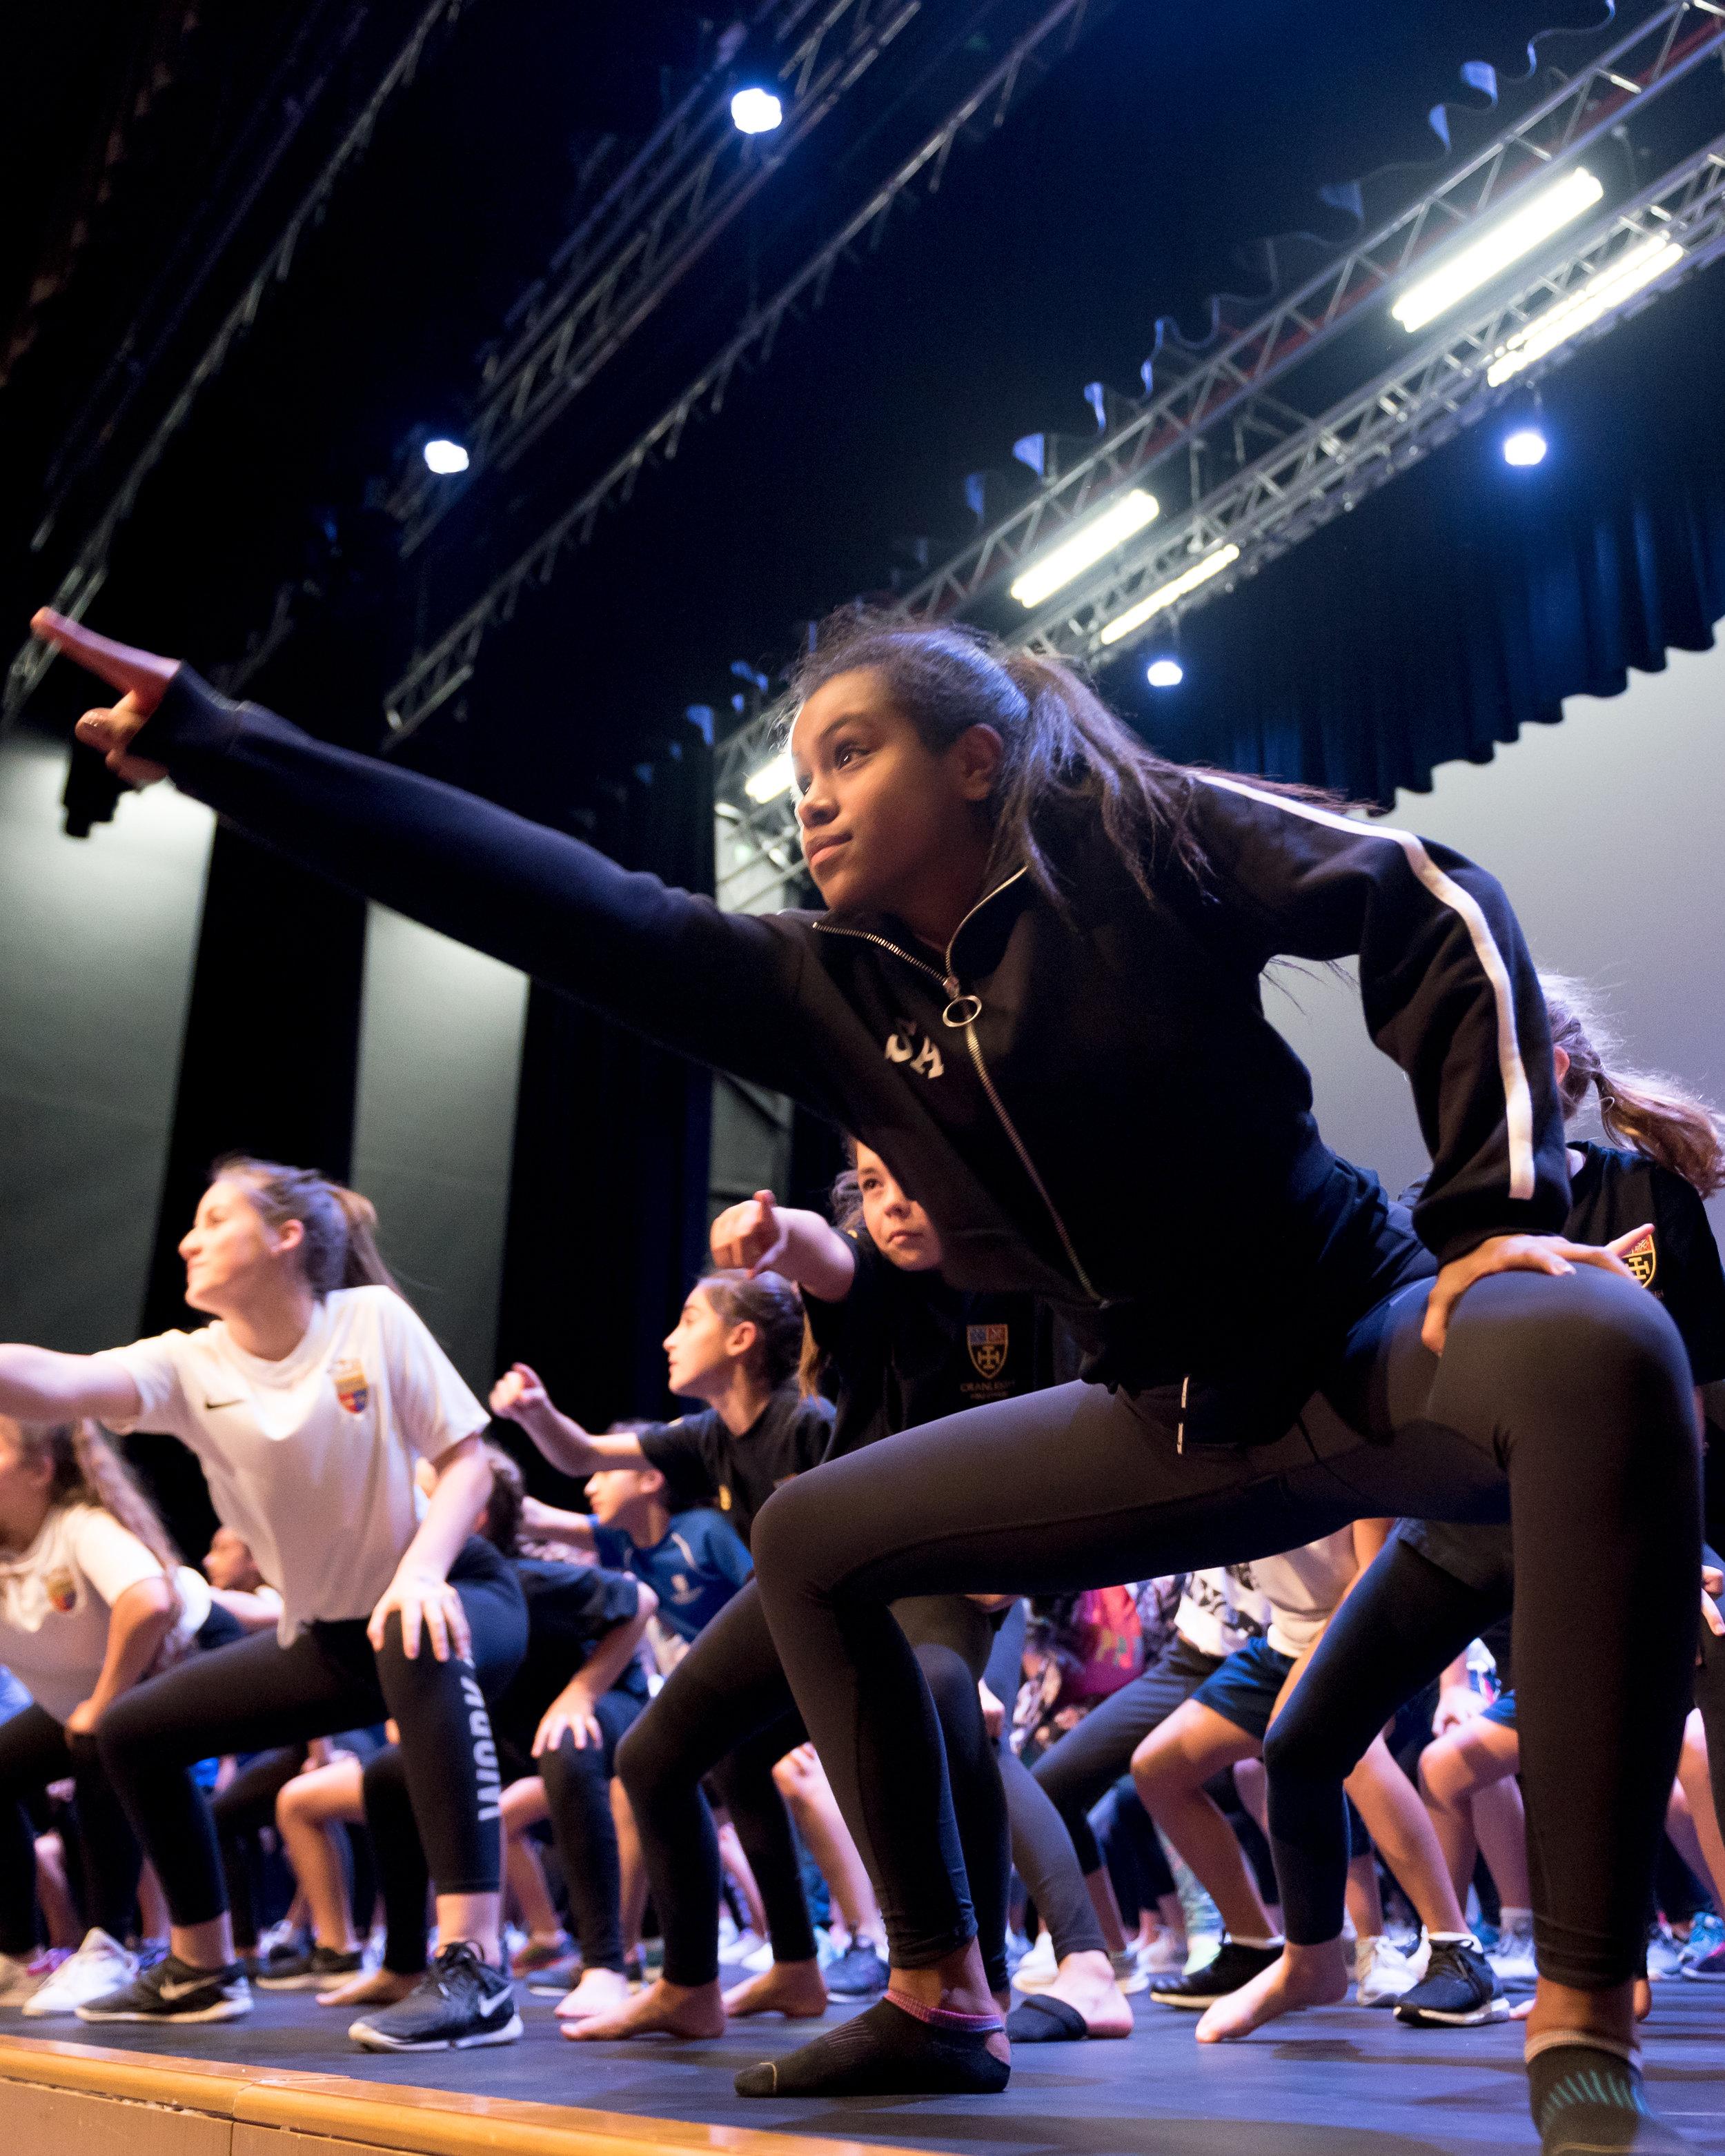 2018-02-22 BSME Dance Invitational-47.jpg